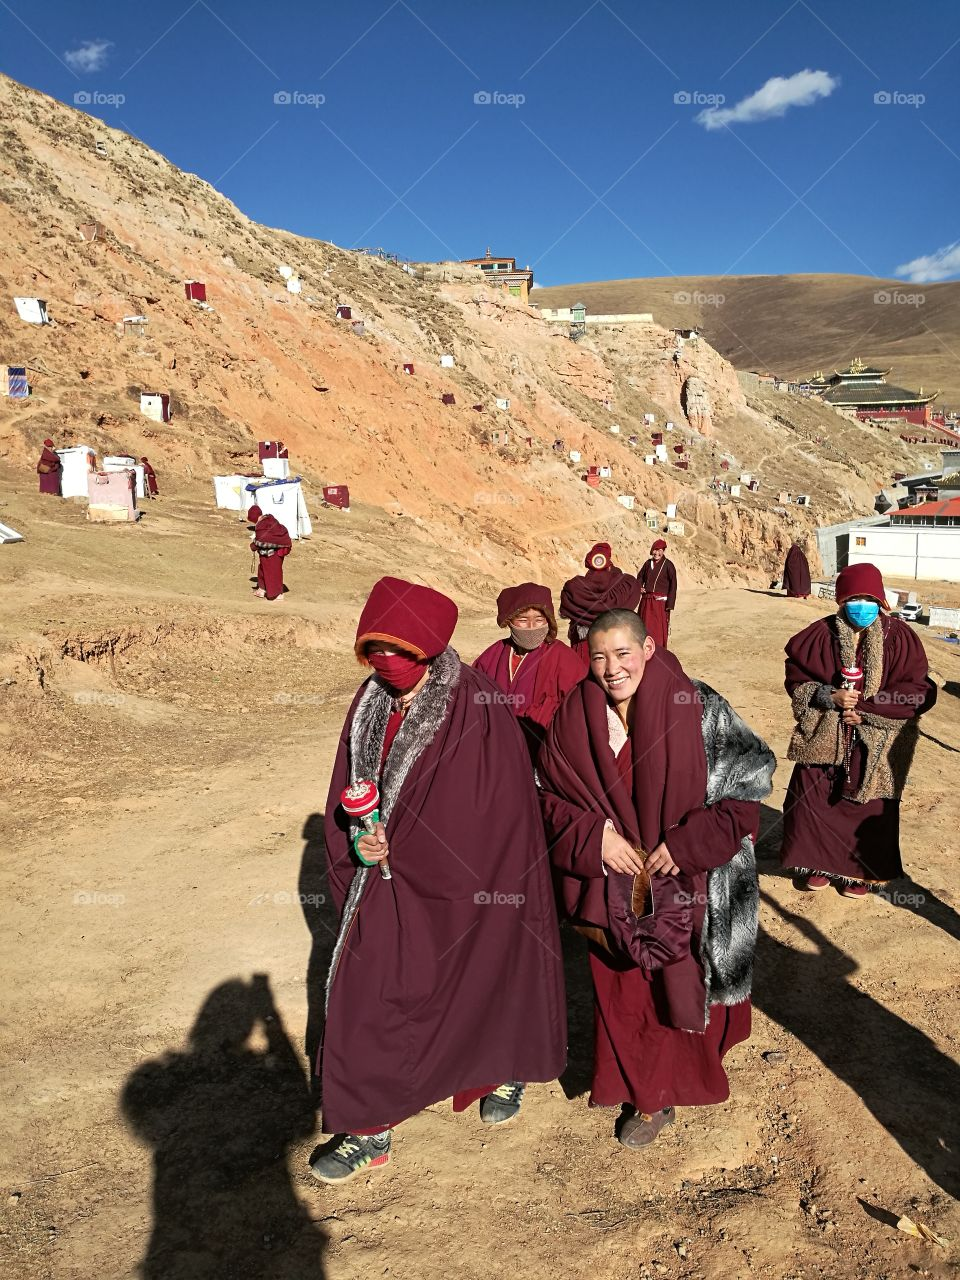 Yaqing Tibetan Buddhist Monastery for Nuns  Buddhism School and Monastery in Ganzi, Sichuan Province, China